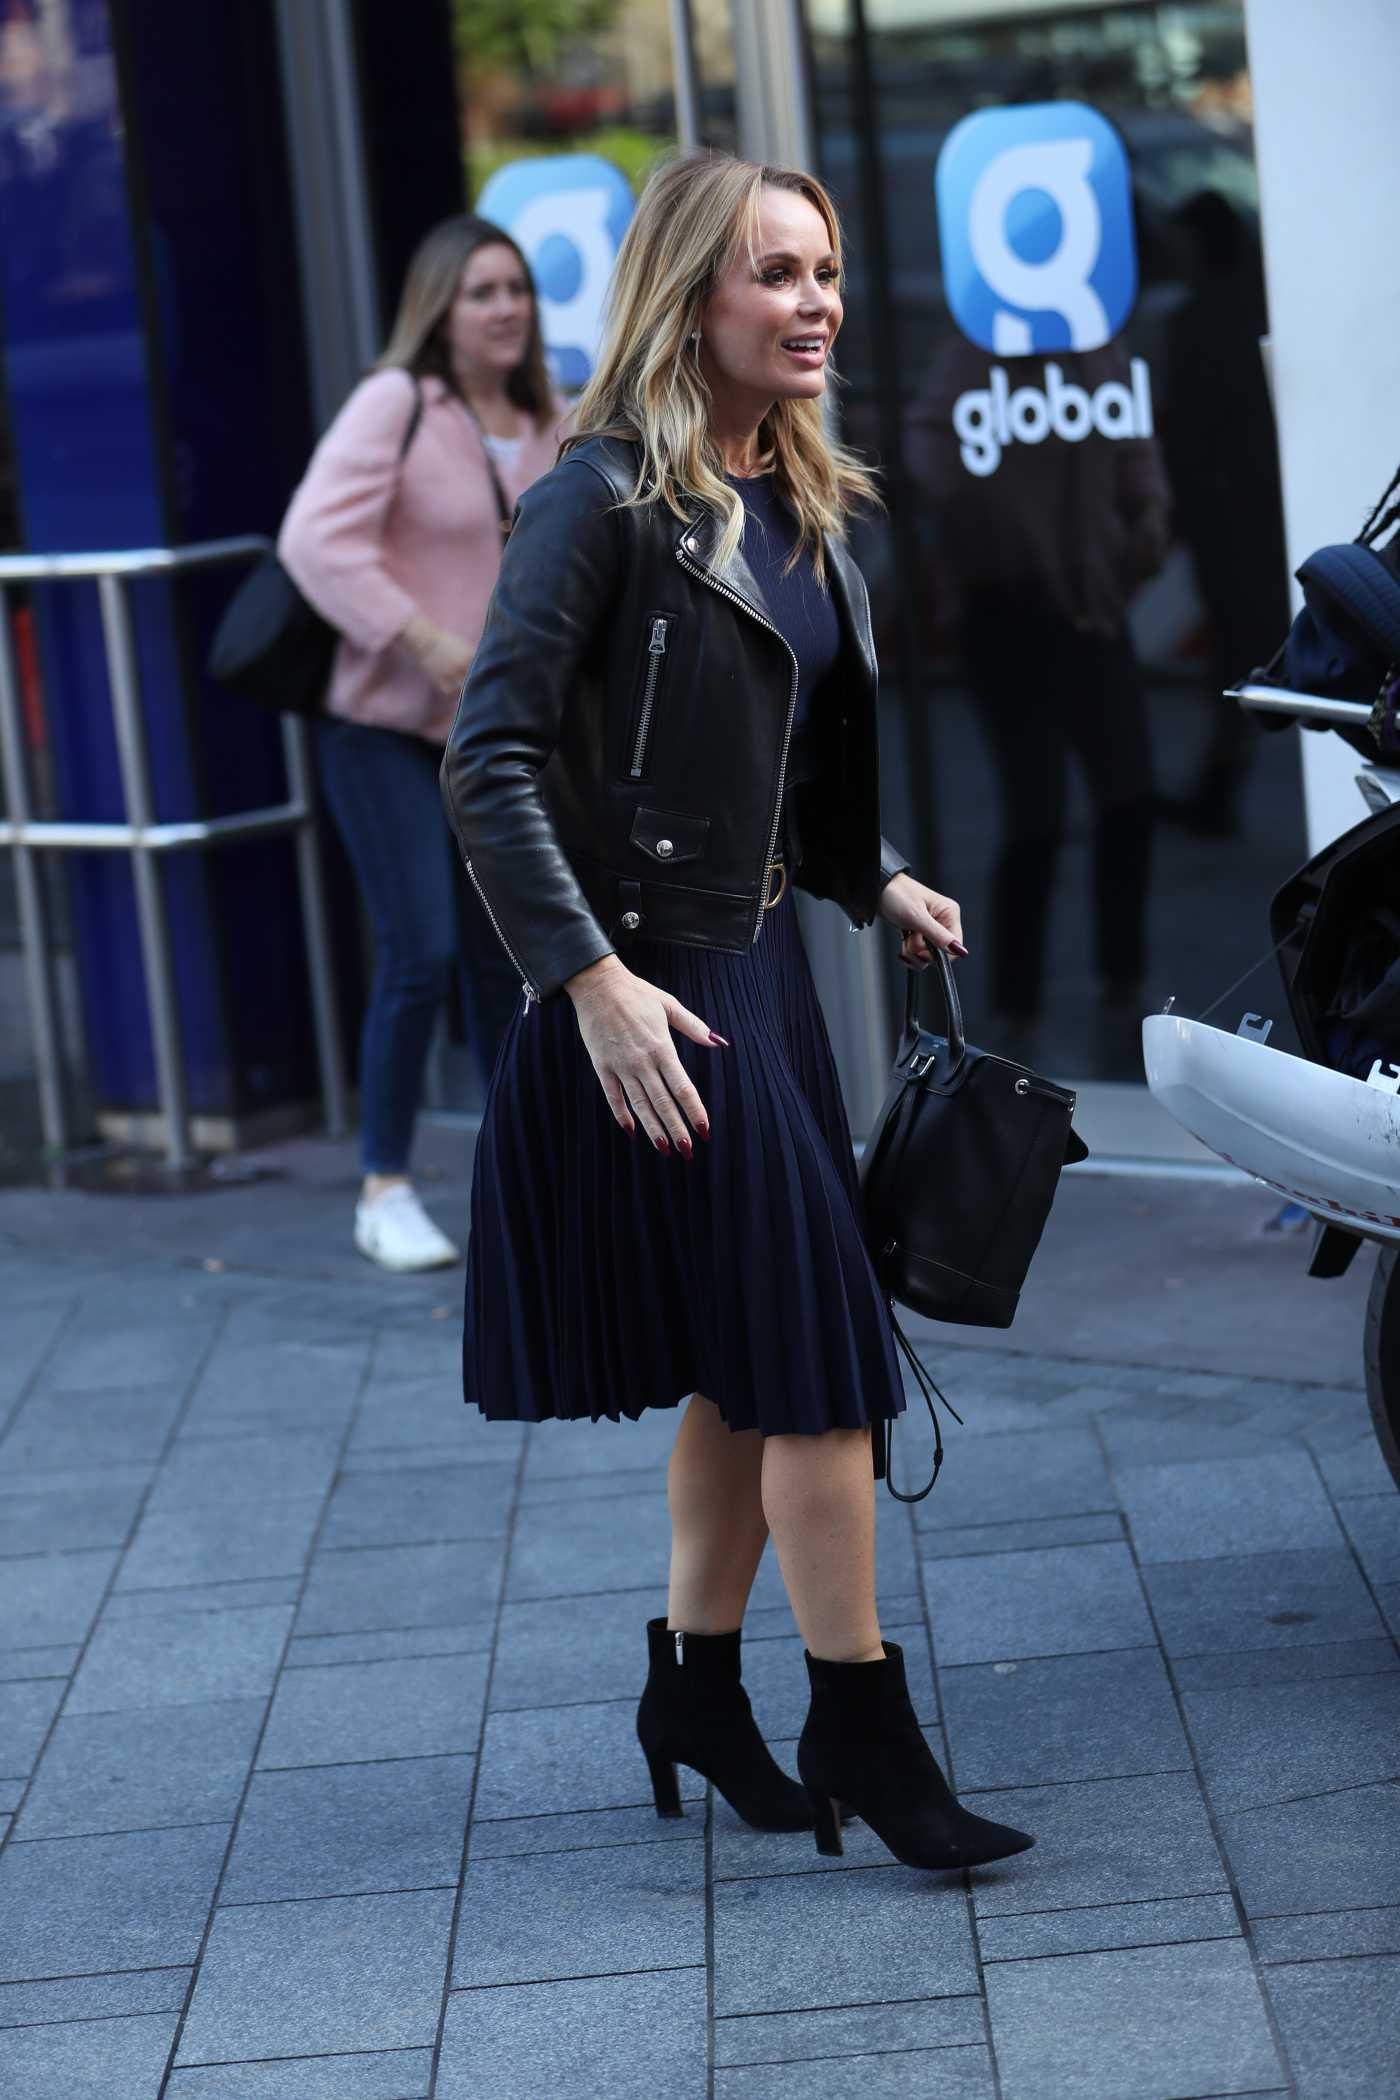 Amanda Holden in a Black Jacket Leaves Global Radio in London 10/18/2019